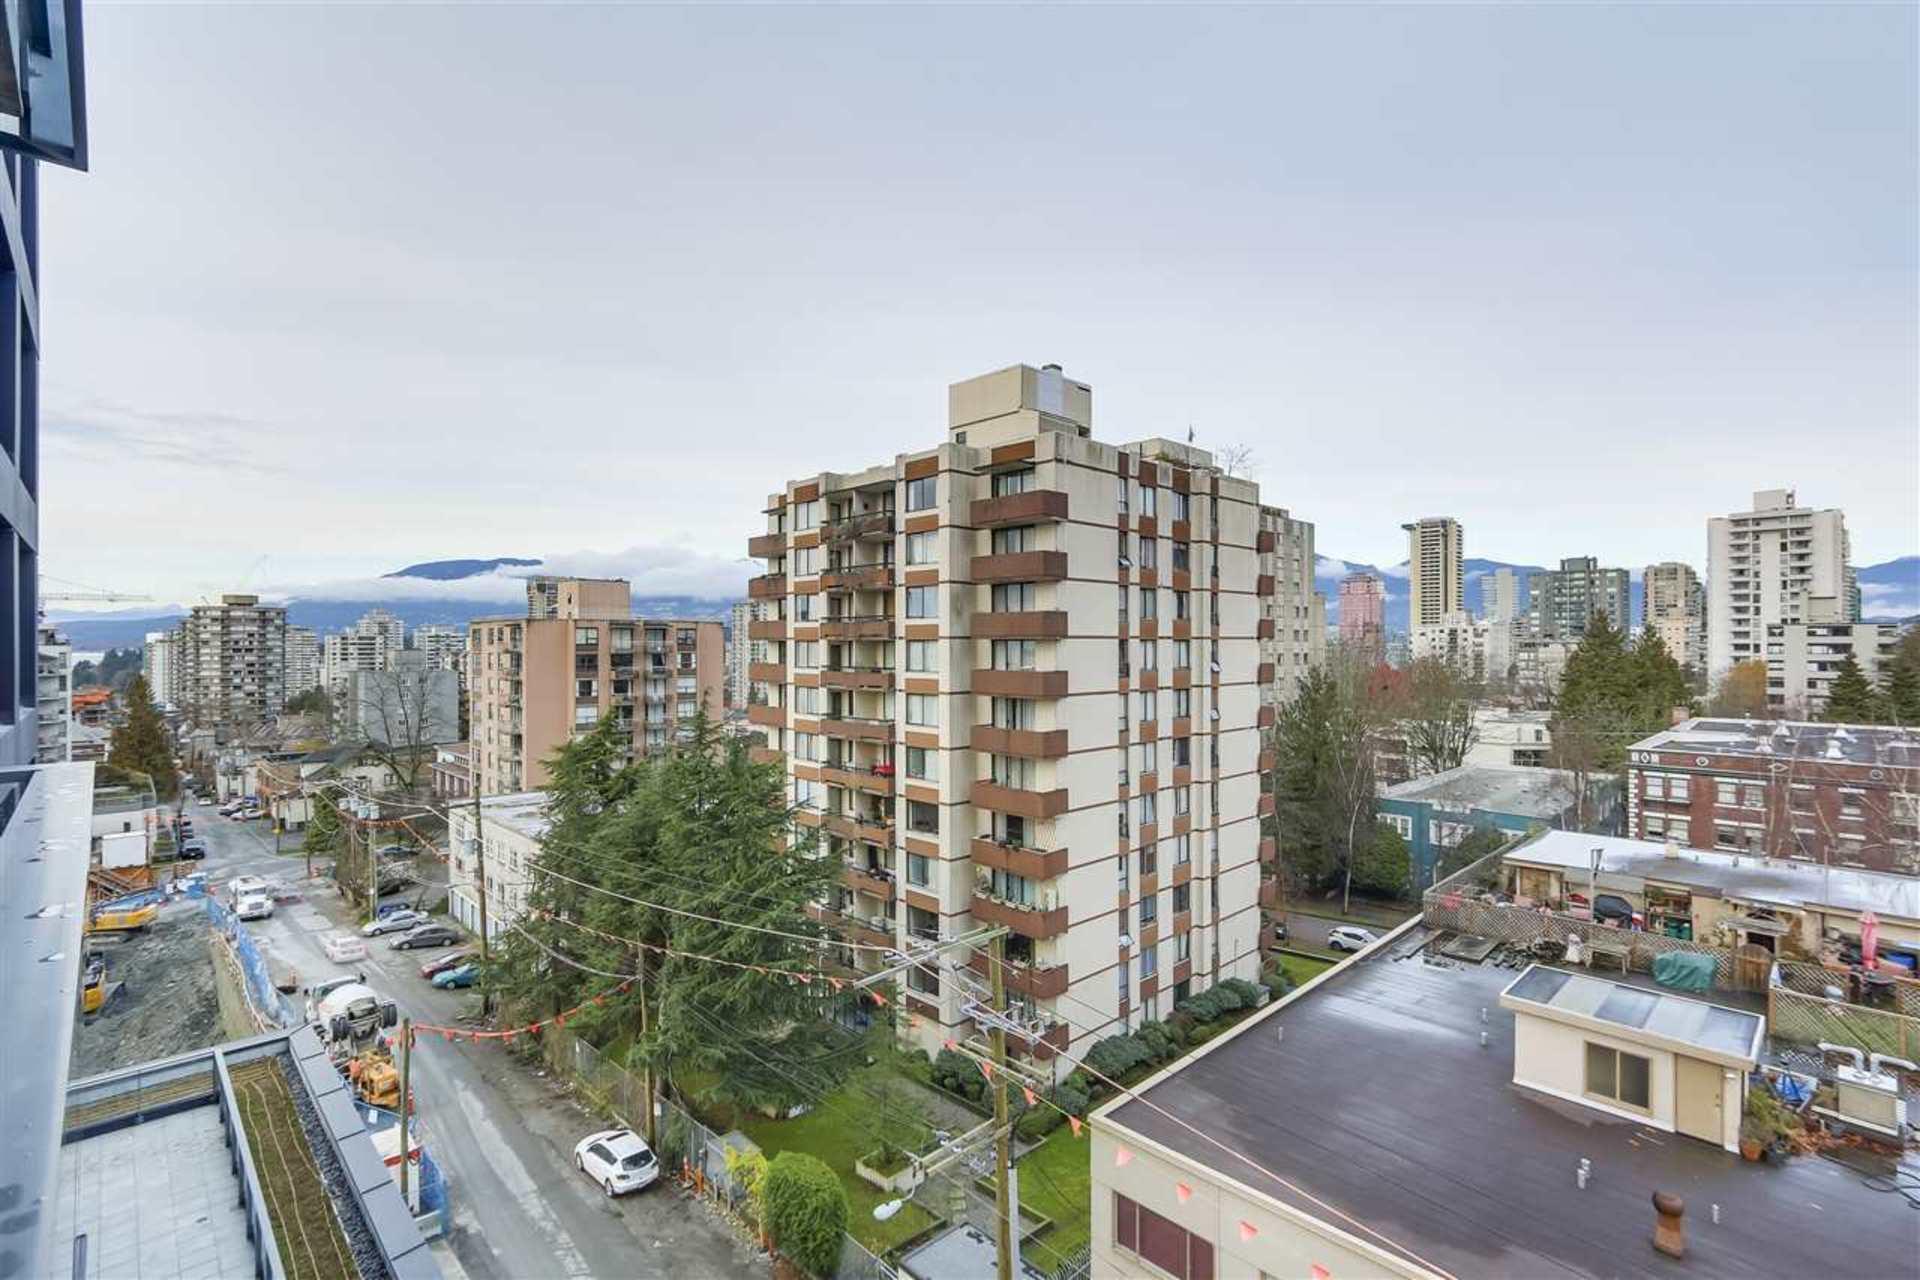 1171-jervis-street-west-end-vw-vancouver-west-16 at 701 - 1171 Jervis Street, West End VW, Vancouver West